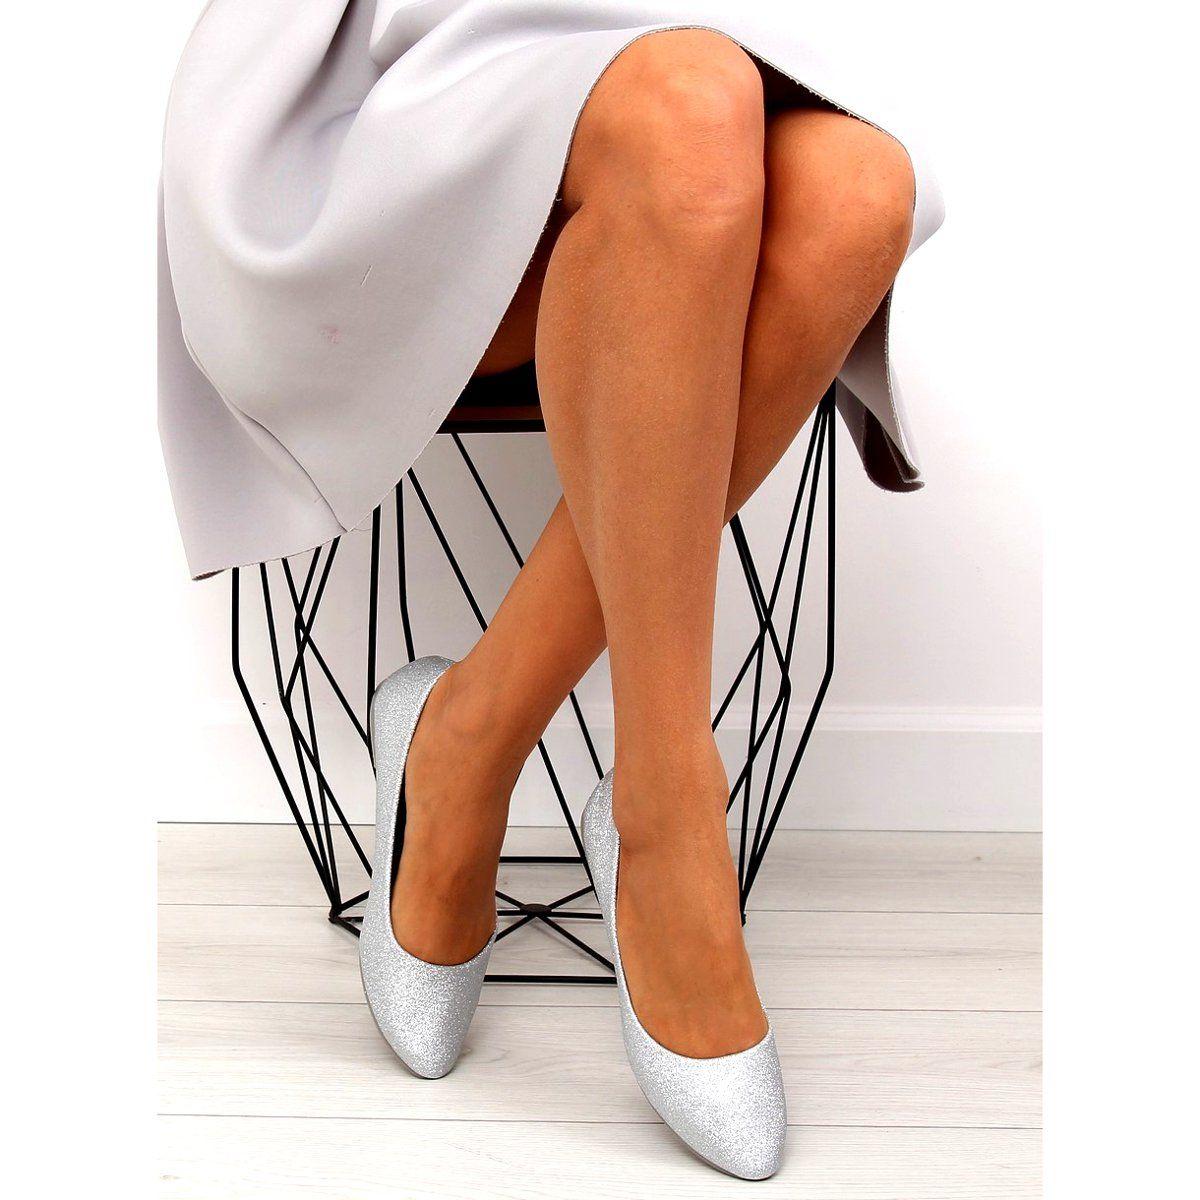 Baleriny Brokatowe Srebrne Cc200p Silver Szare Stiletto Heels Heels Fashion